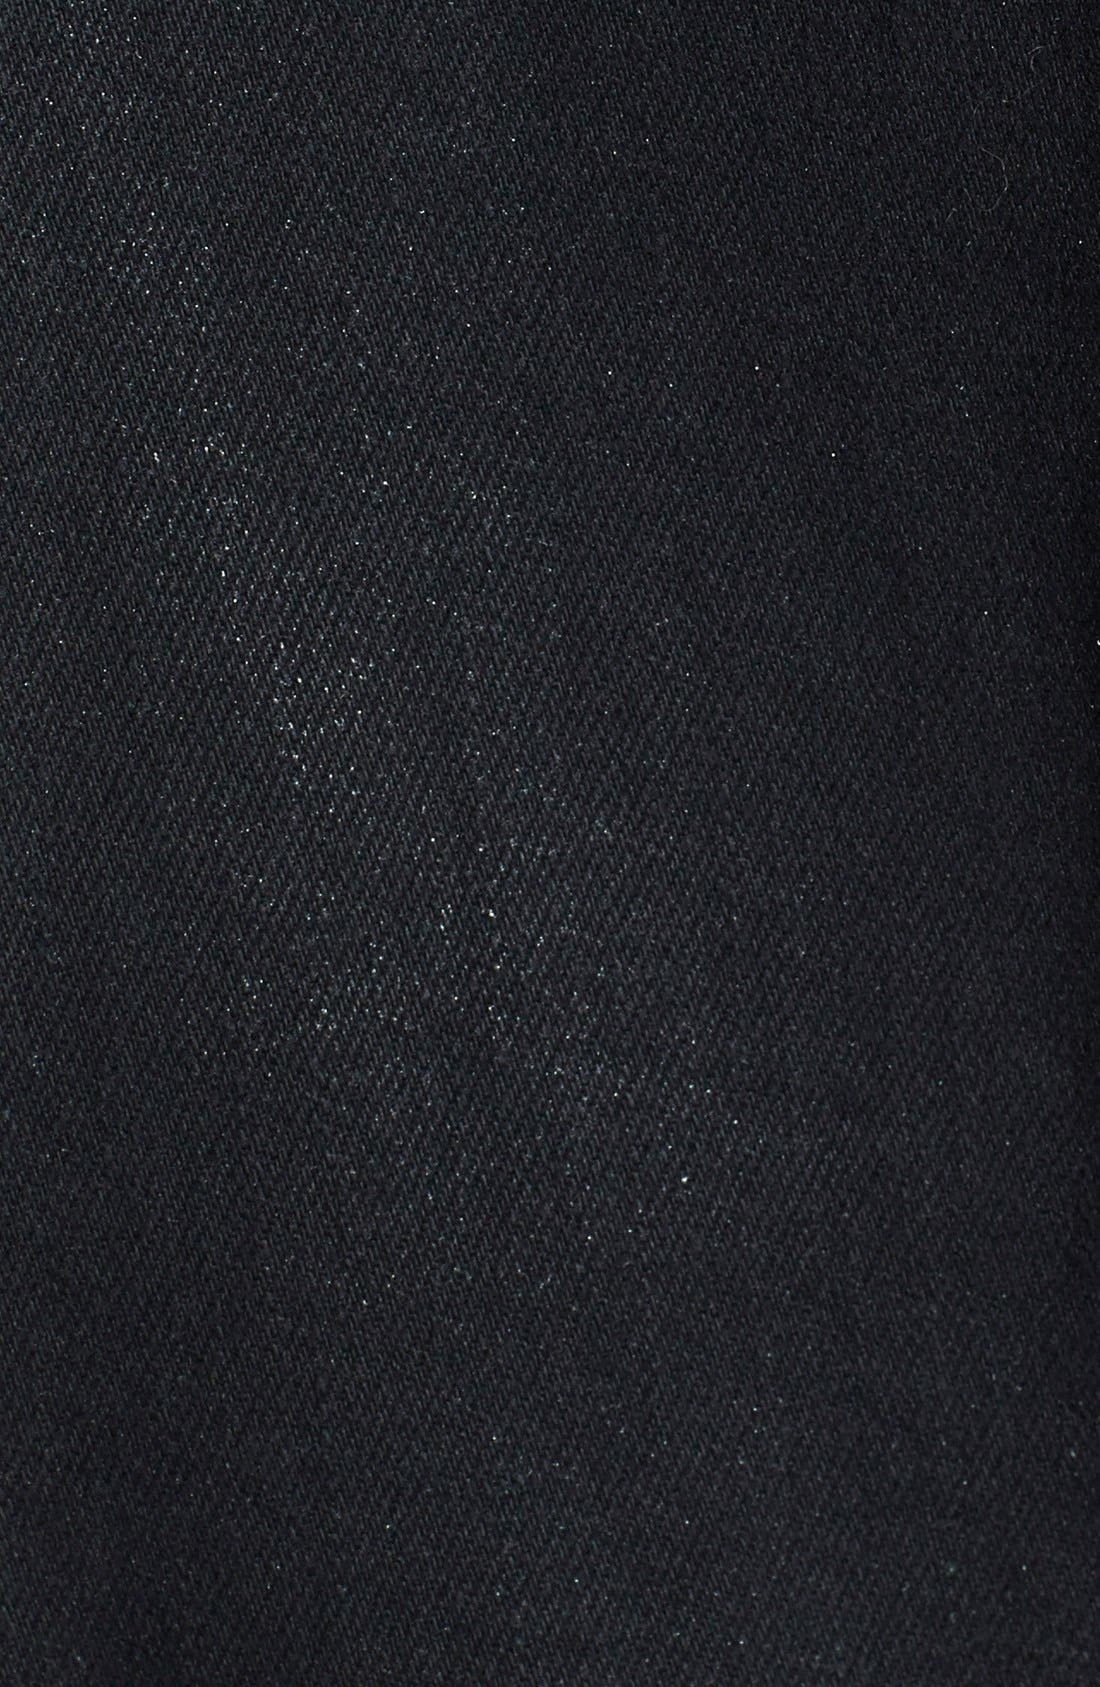 'Cynic' Moto Jacket,                             Alternate thumbnail 4, color,                             001